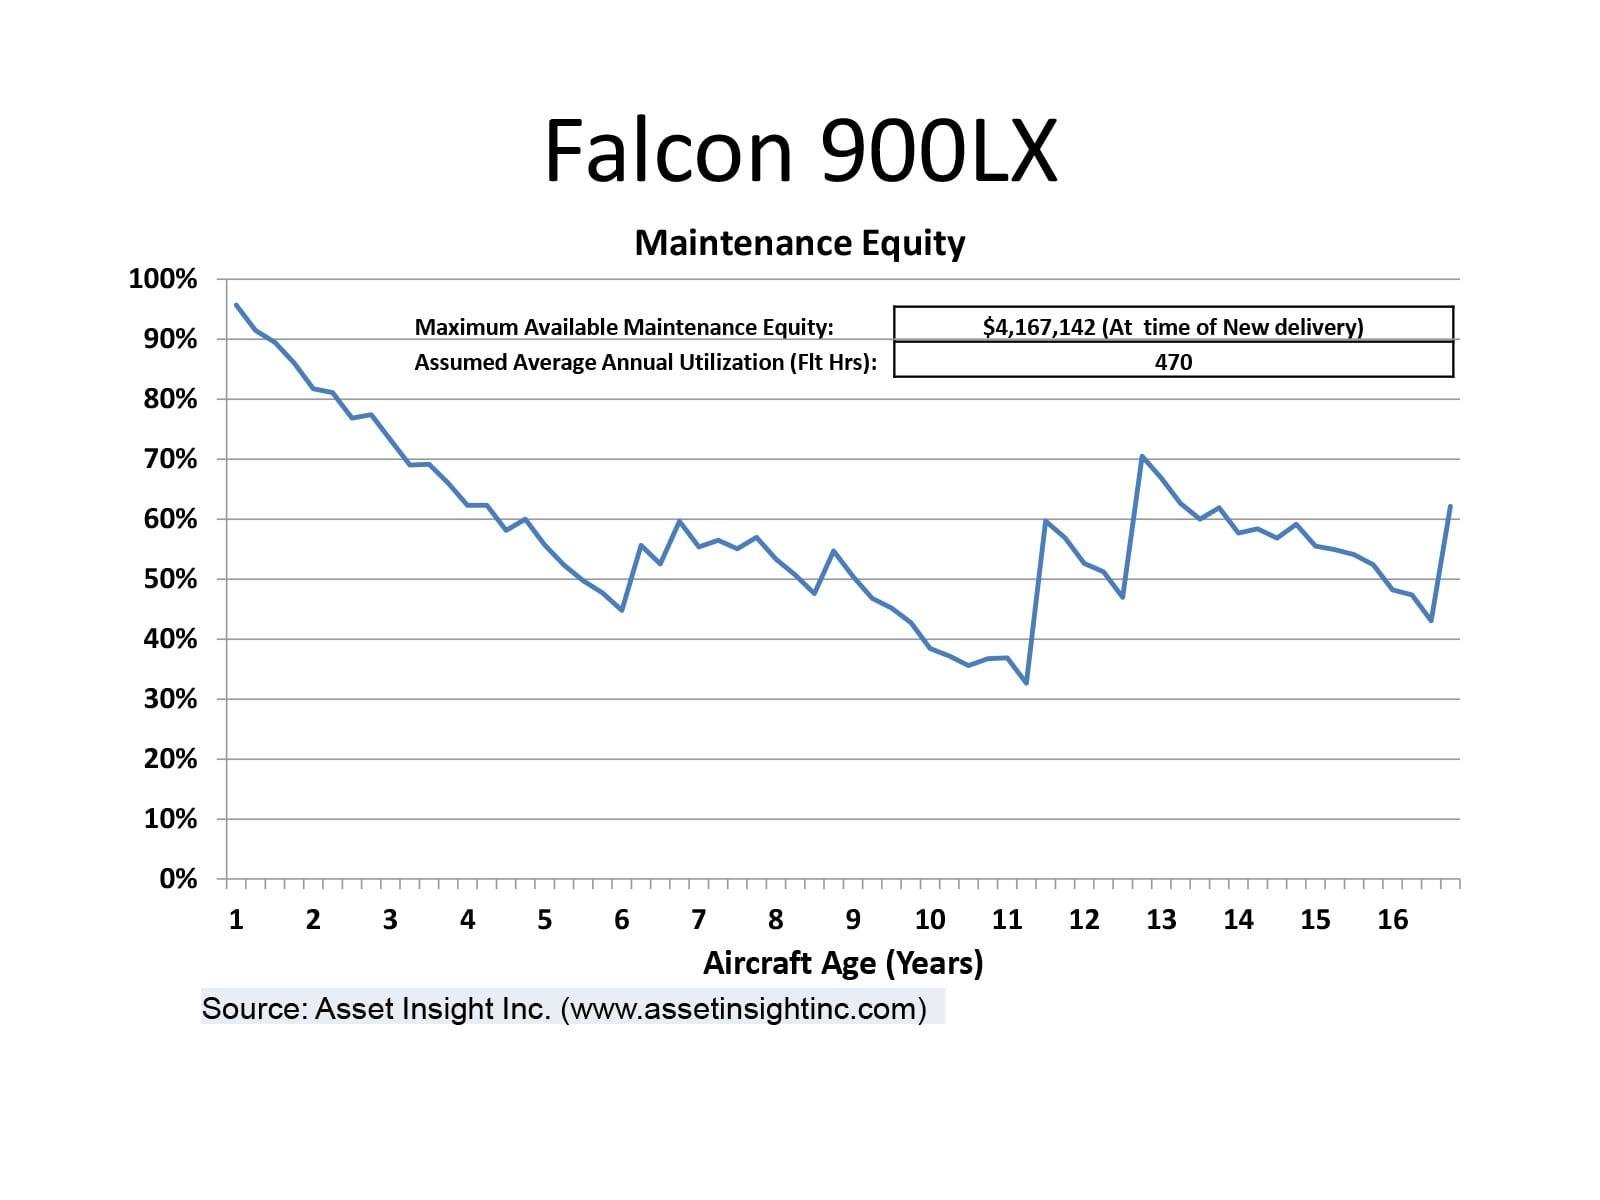 DFalcon 900LX maintenance equity chart